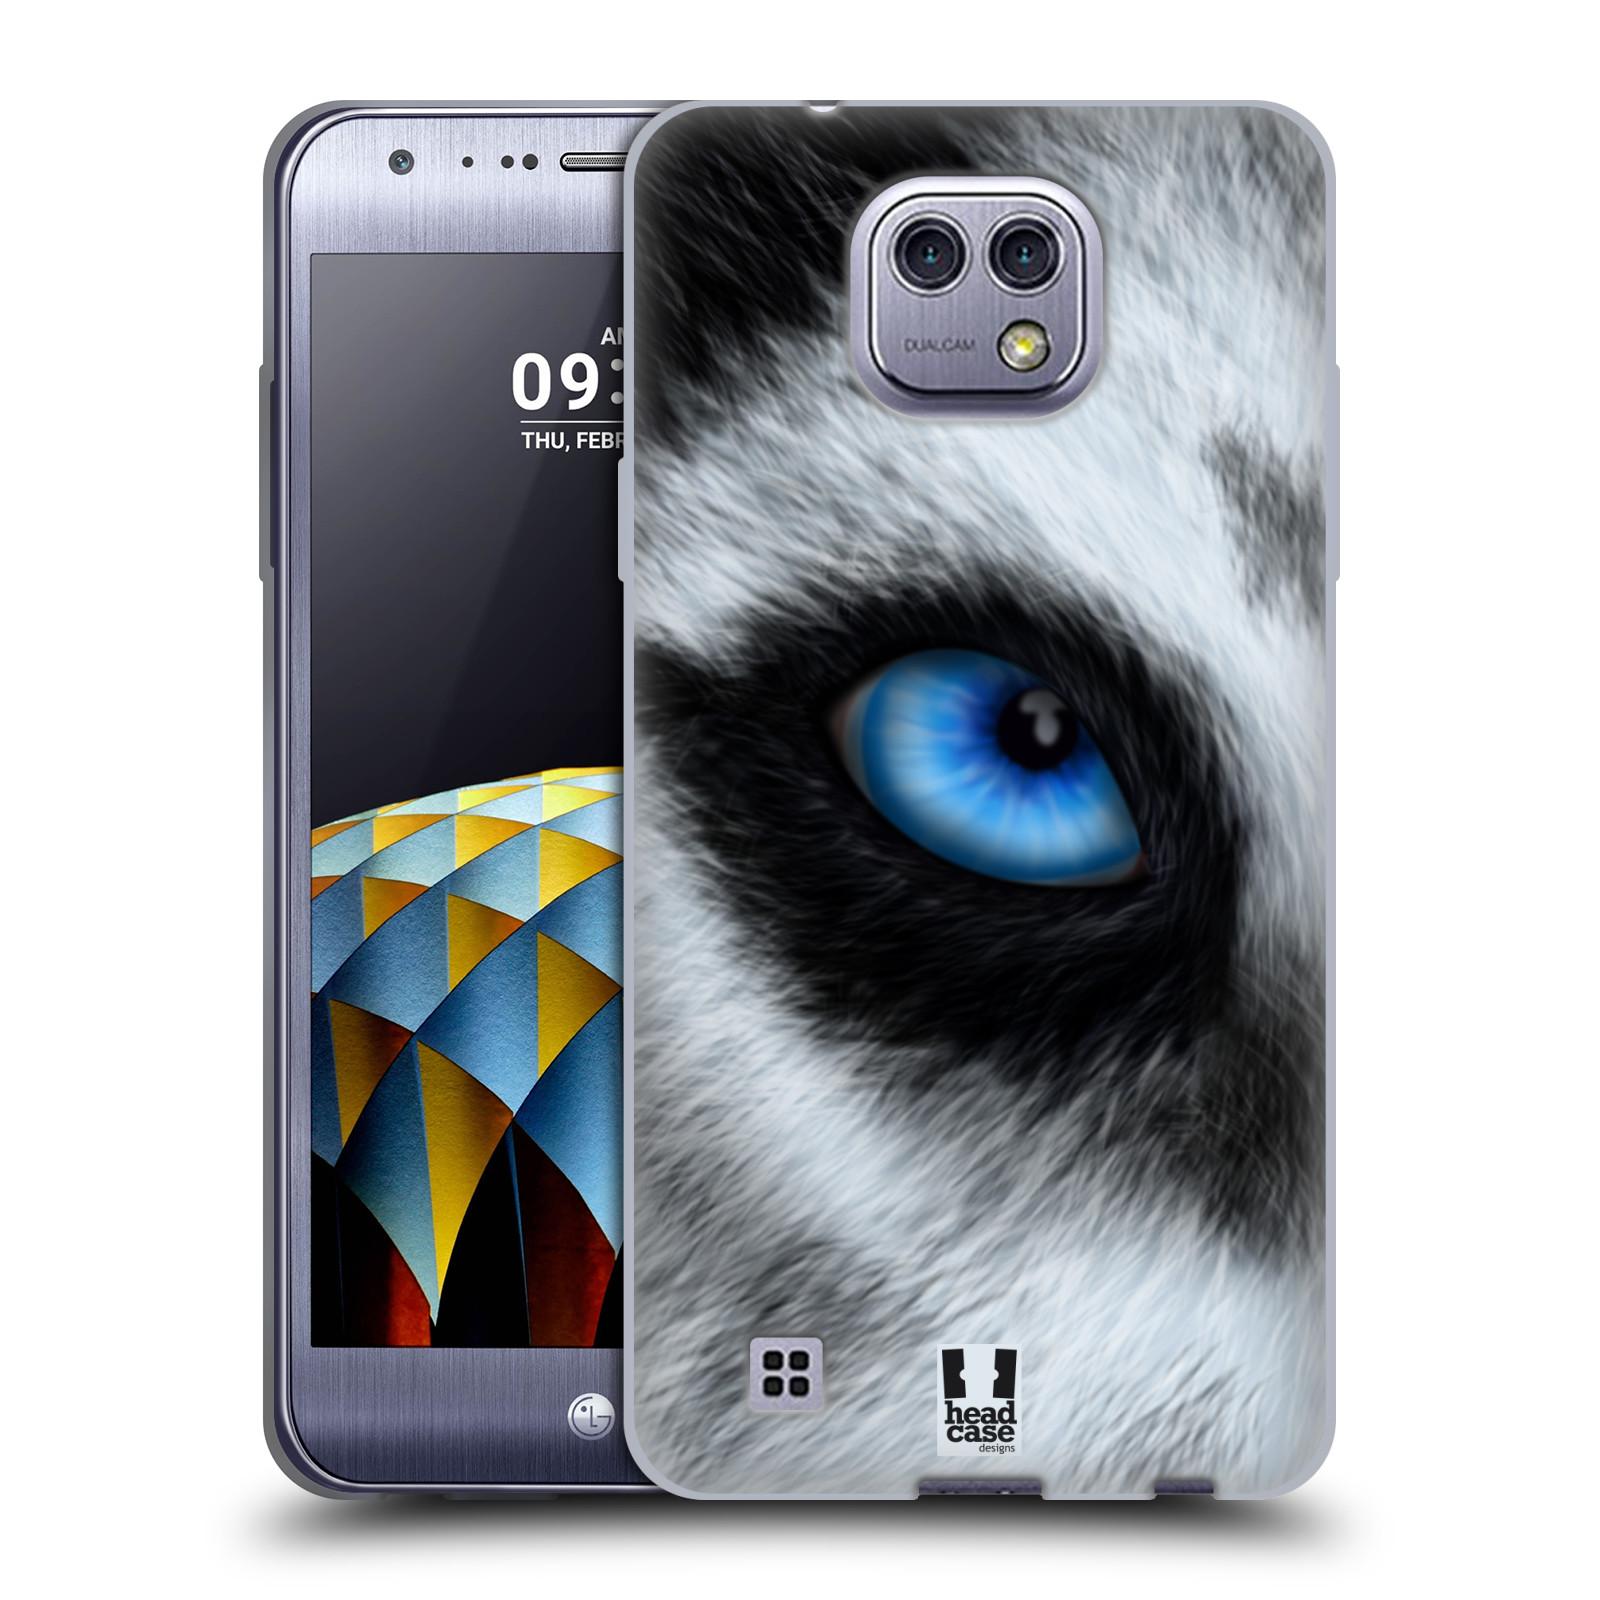 HEAD CASE silikonový obal na mobil LG X Cam vzor pohled zvířete oko pes husky